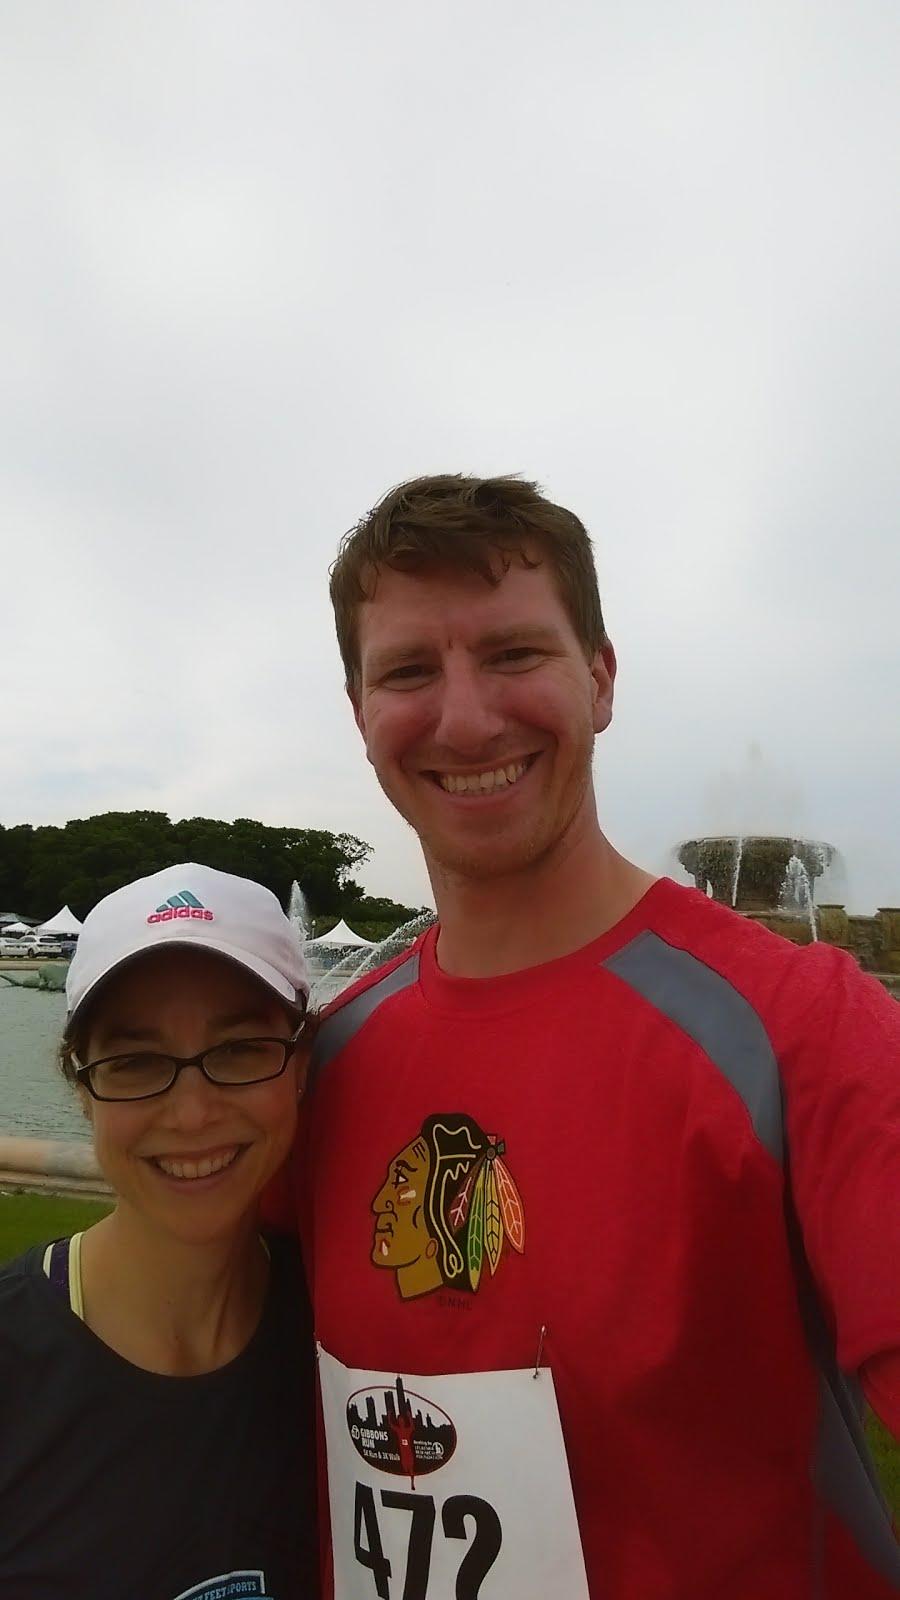 Pre-Race Selfie